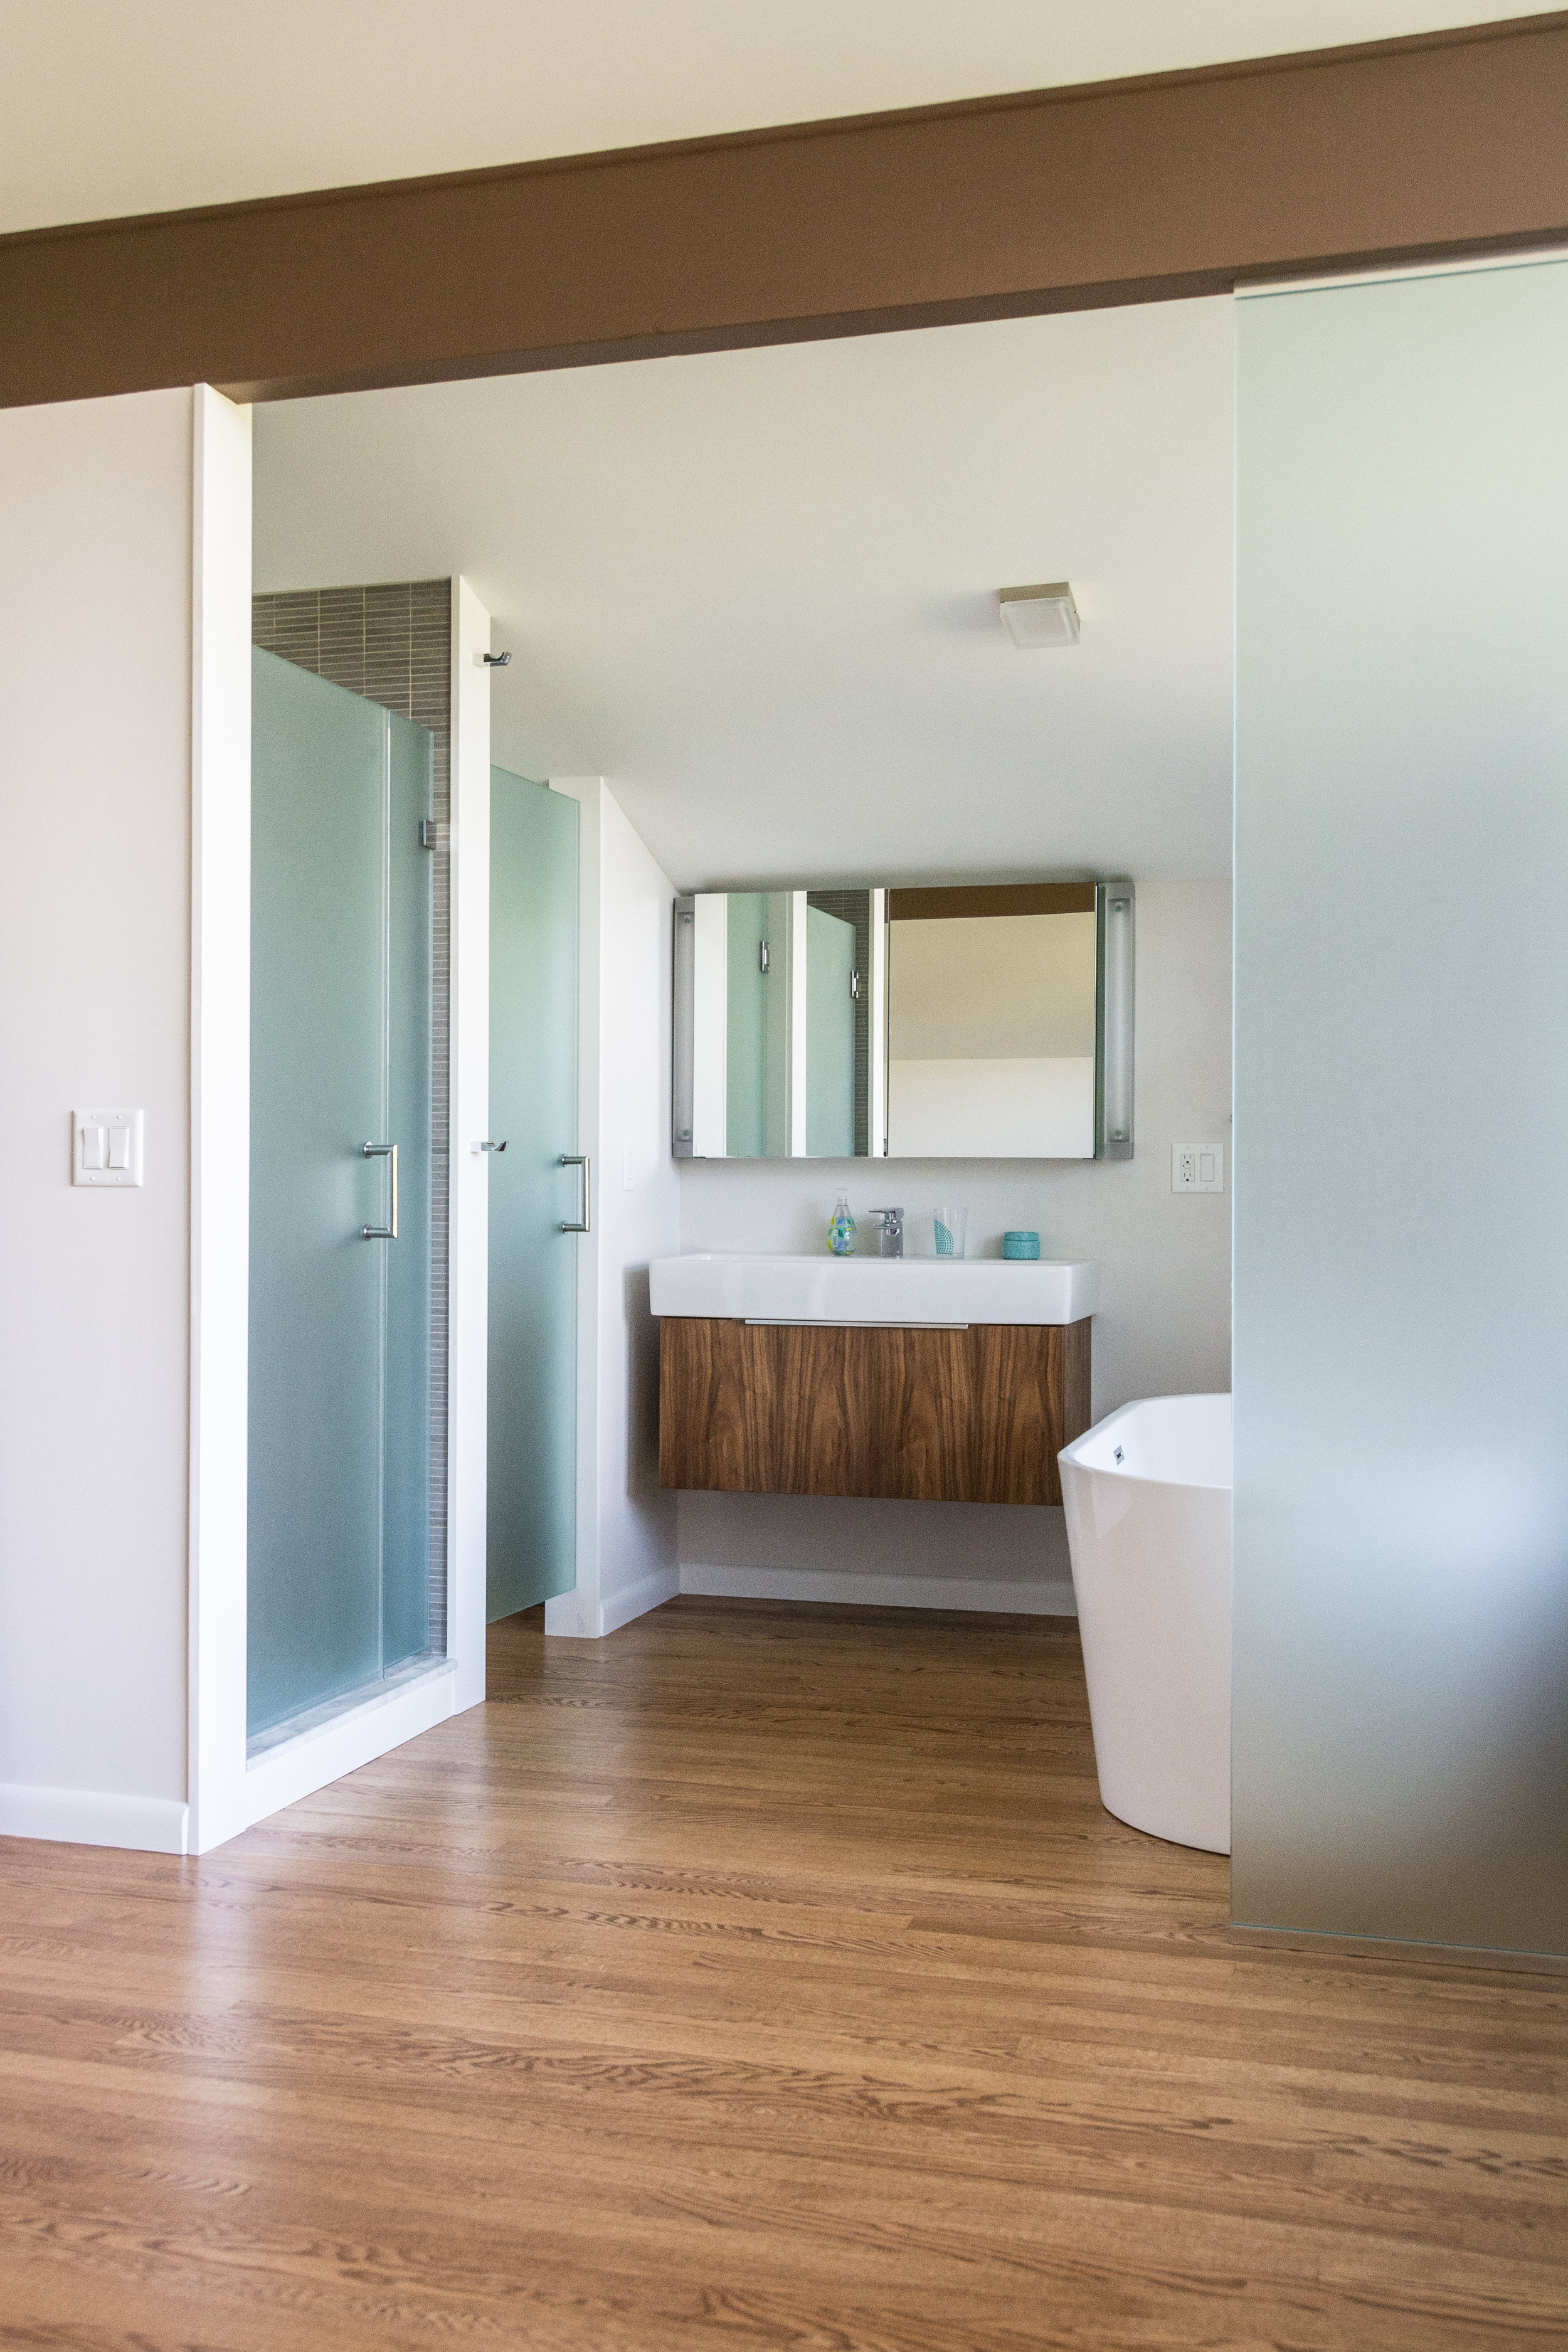 41 Cluett Dr_Master Bathroom-9587.jpg